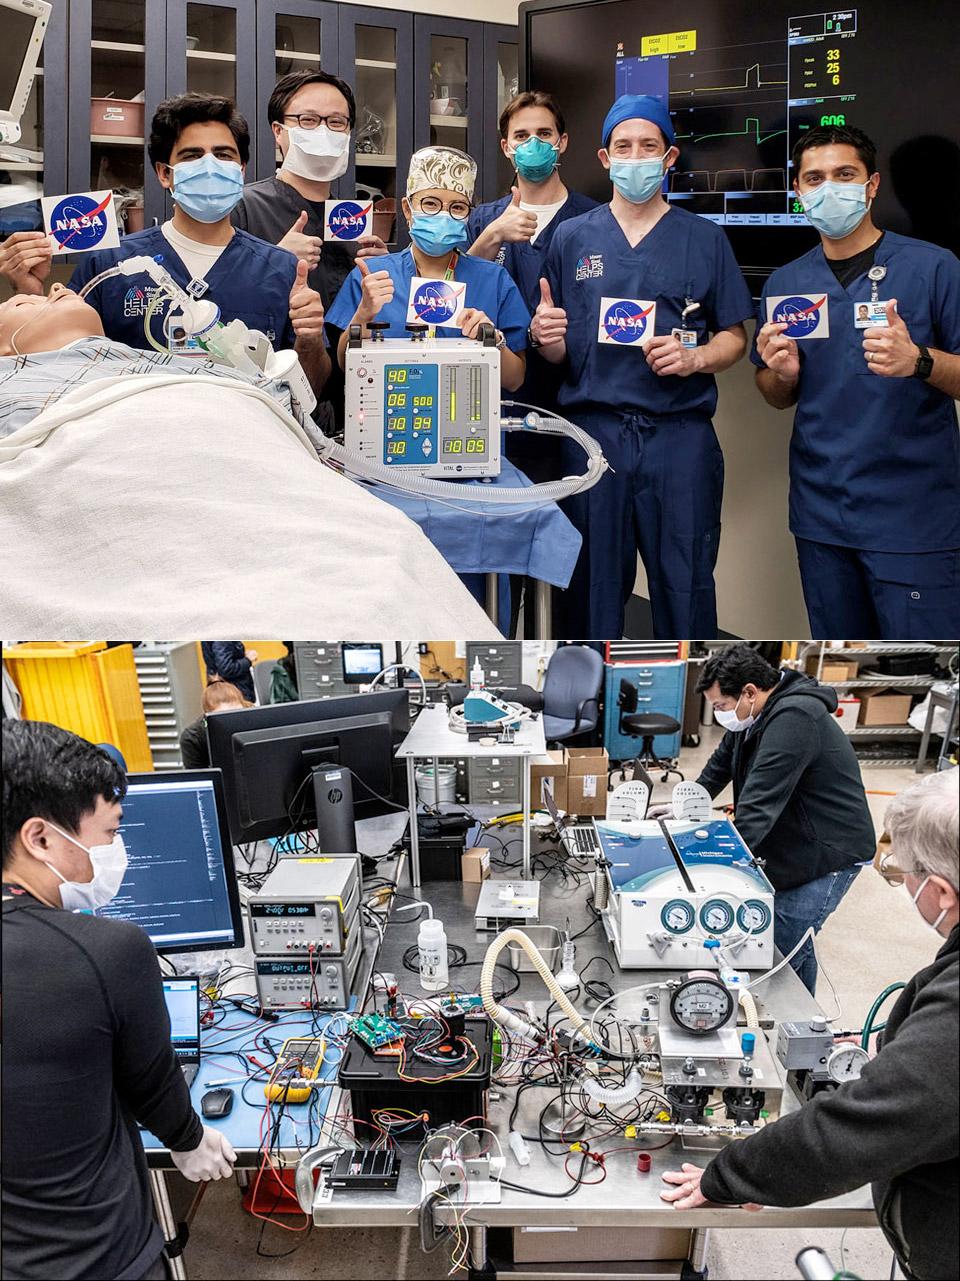 NASA Ventilator